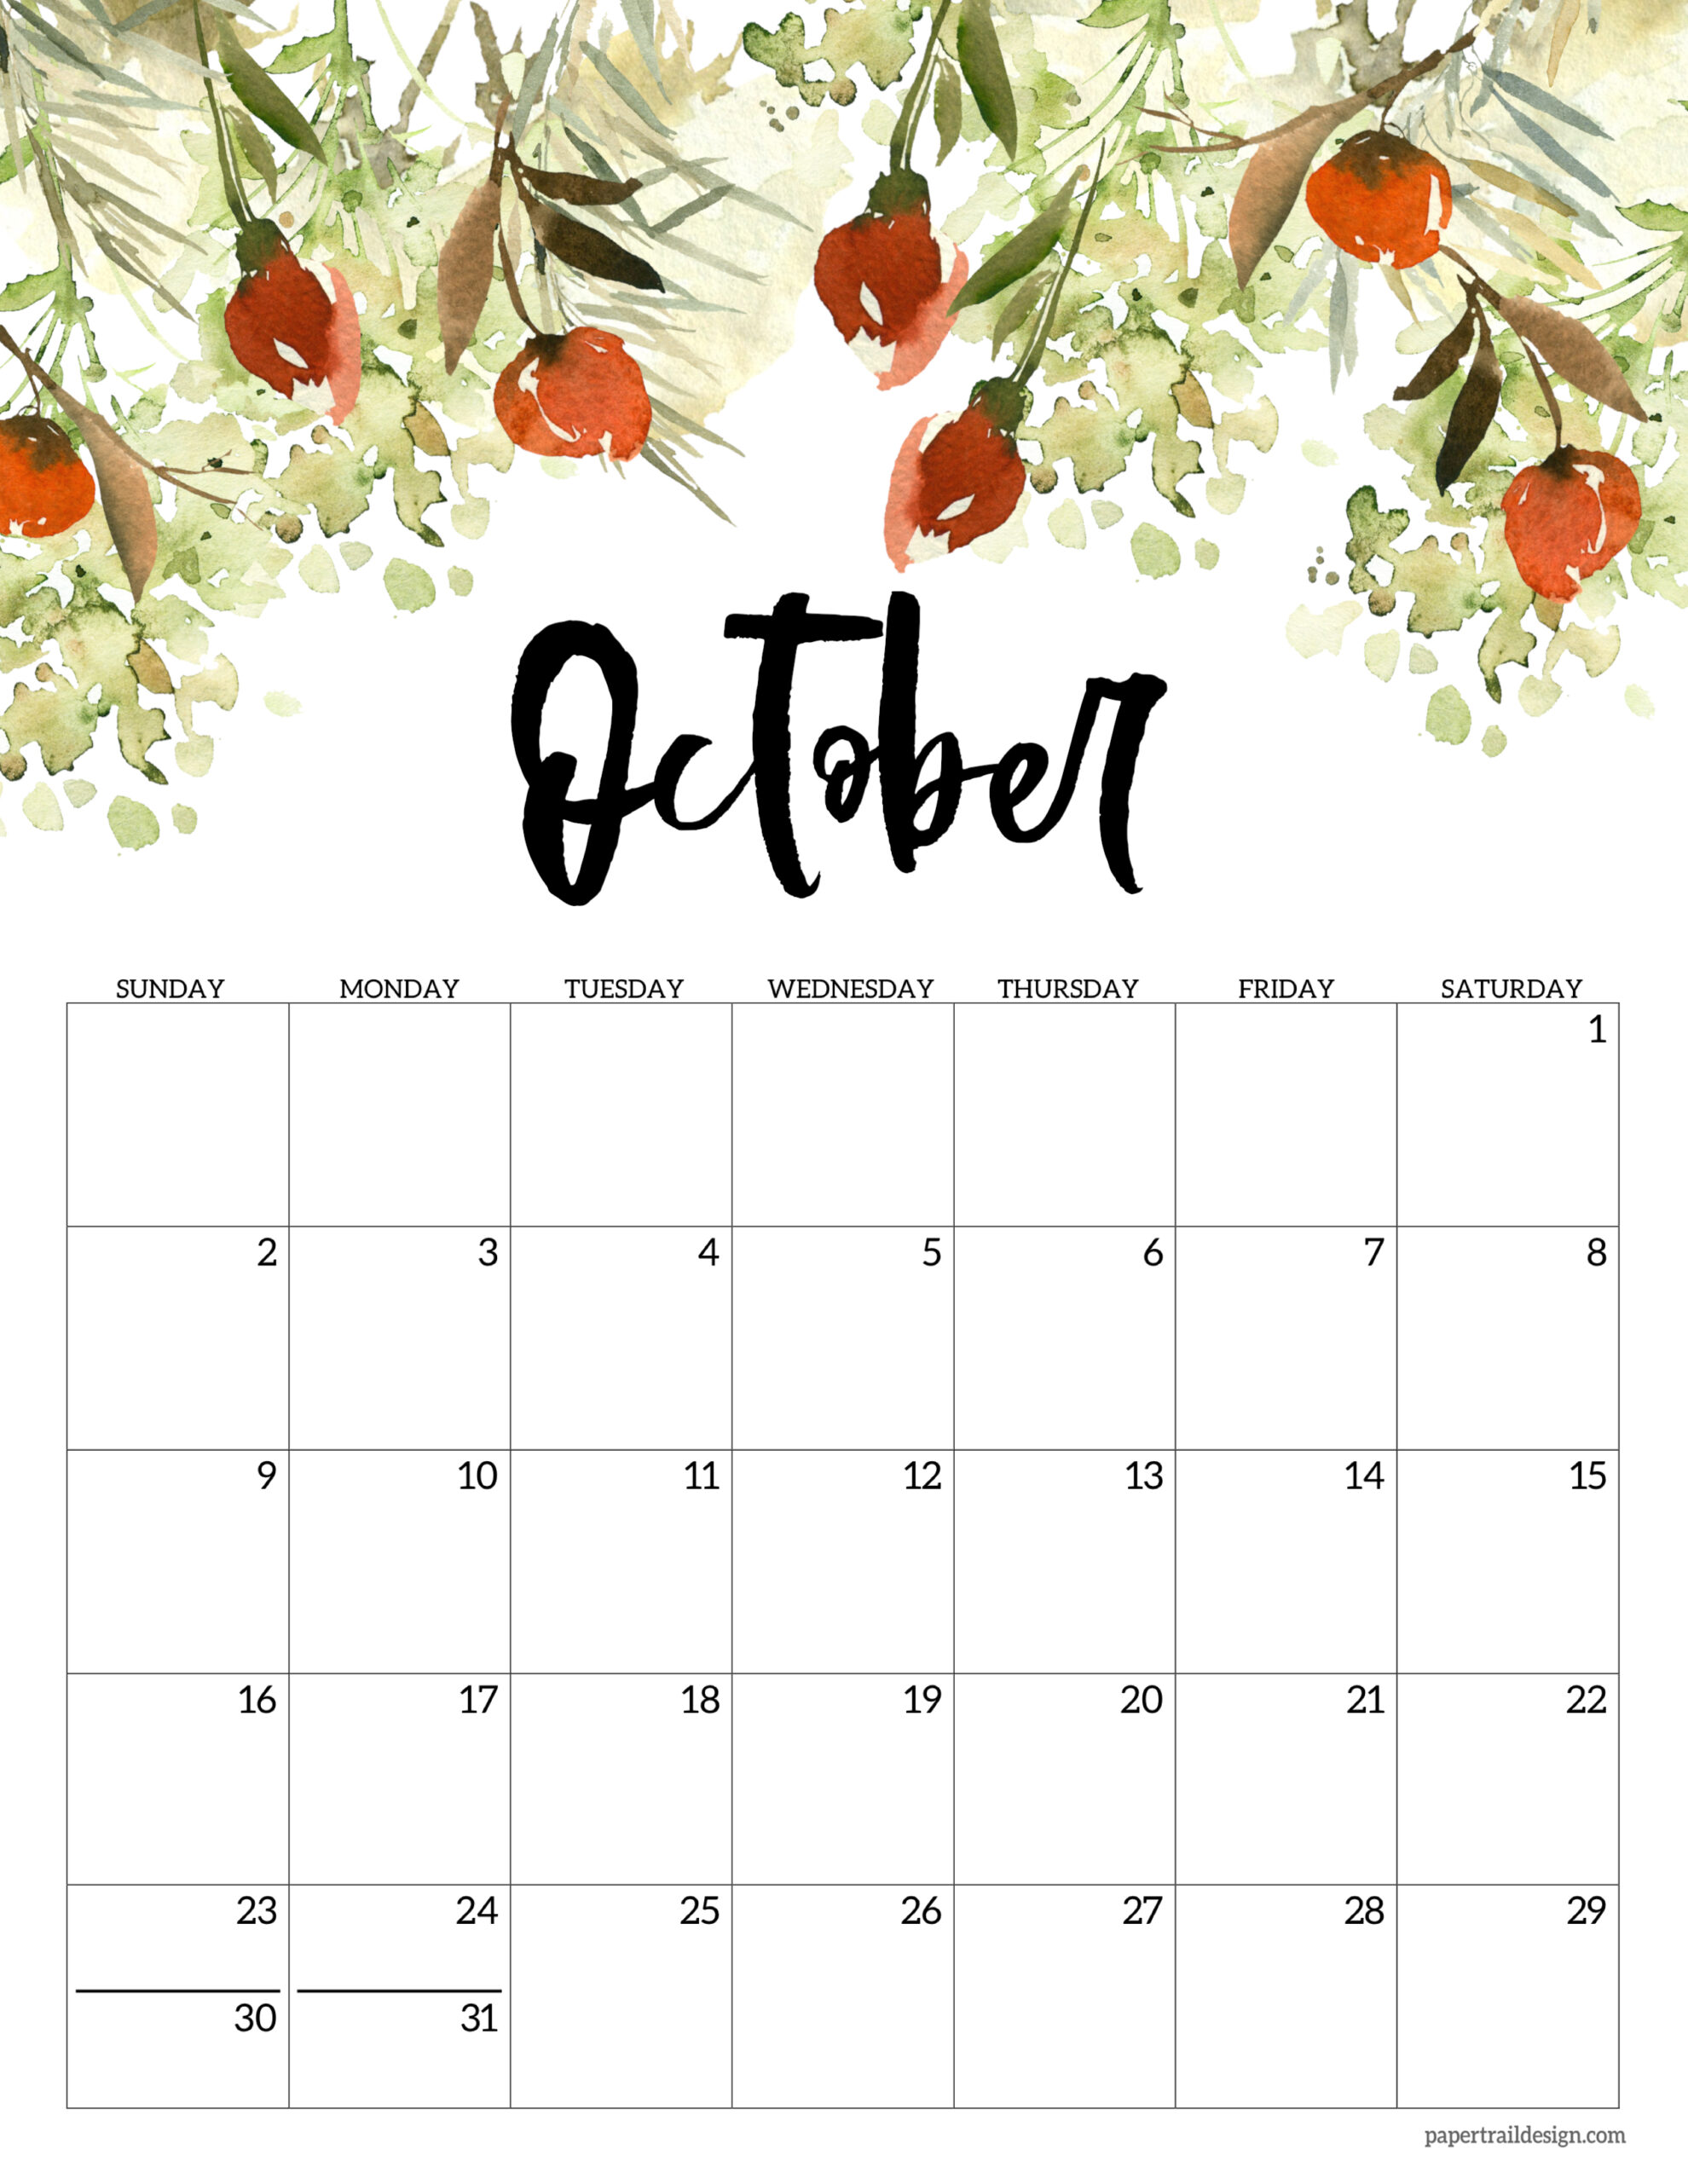 Free Printable Calendar October 2022.Free 2022 Calendar Printable Floral Paper Trail Design